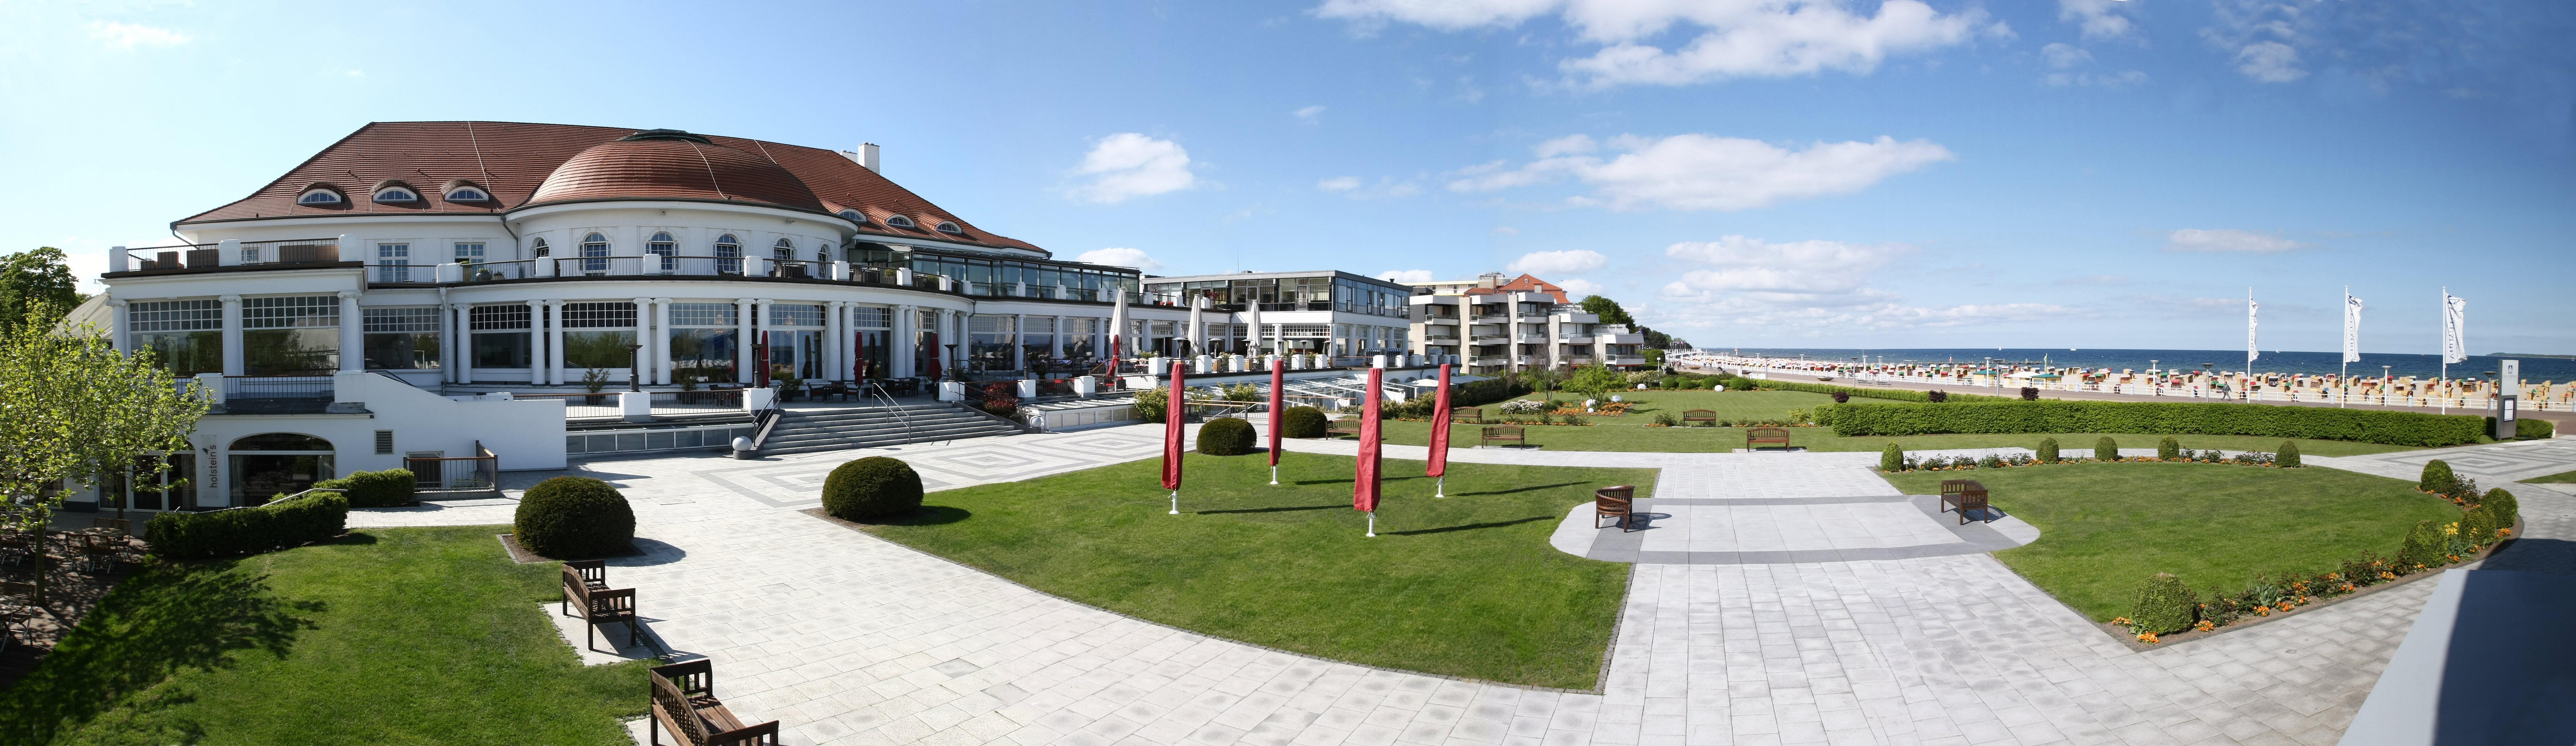 atlantic hotelgruppe bernimmt columbia hotels in wilhelmshaven und travem nde allgemein. Black Bedroom Furniture Sets. Home Design Ideas